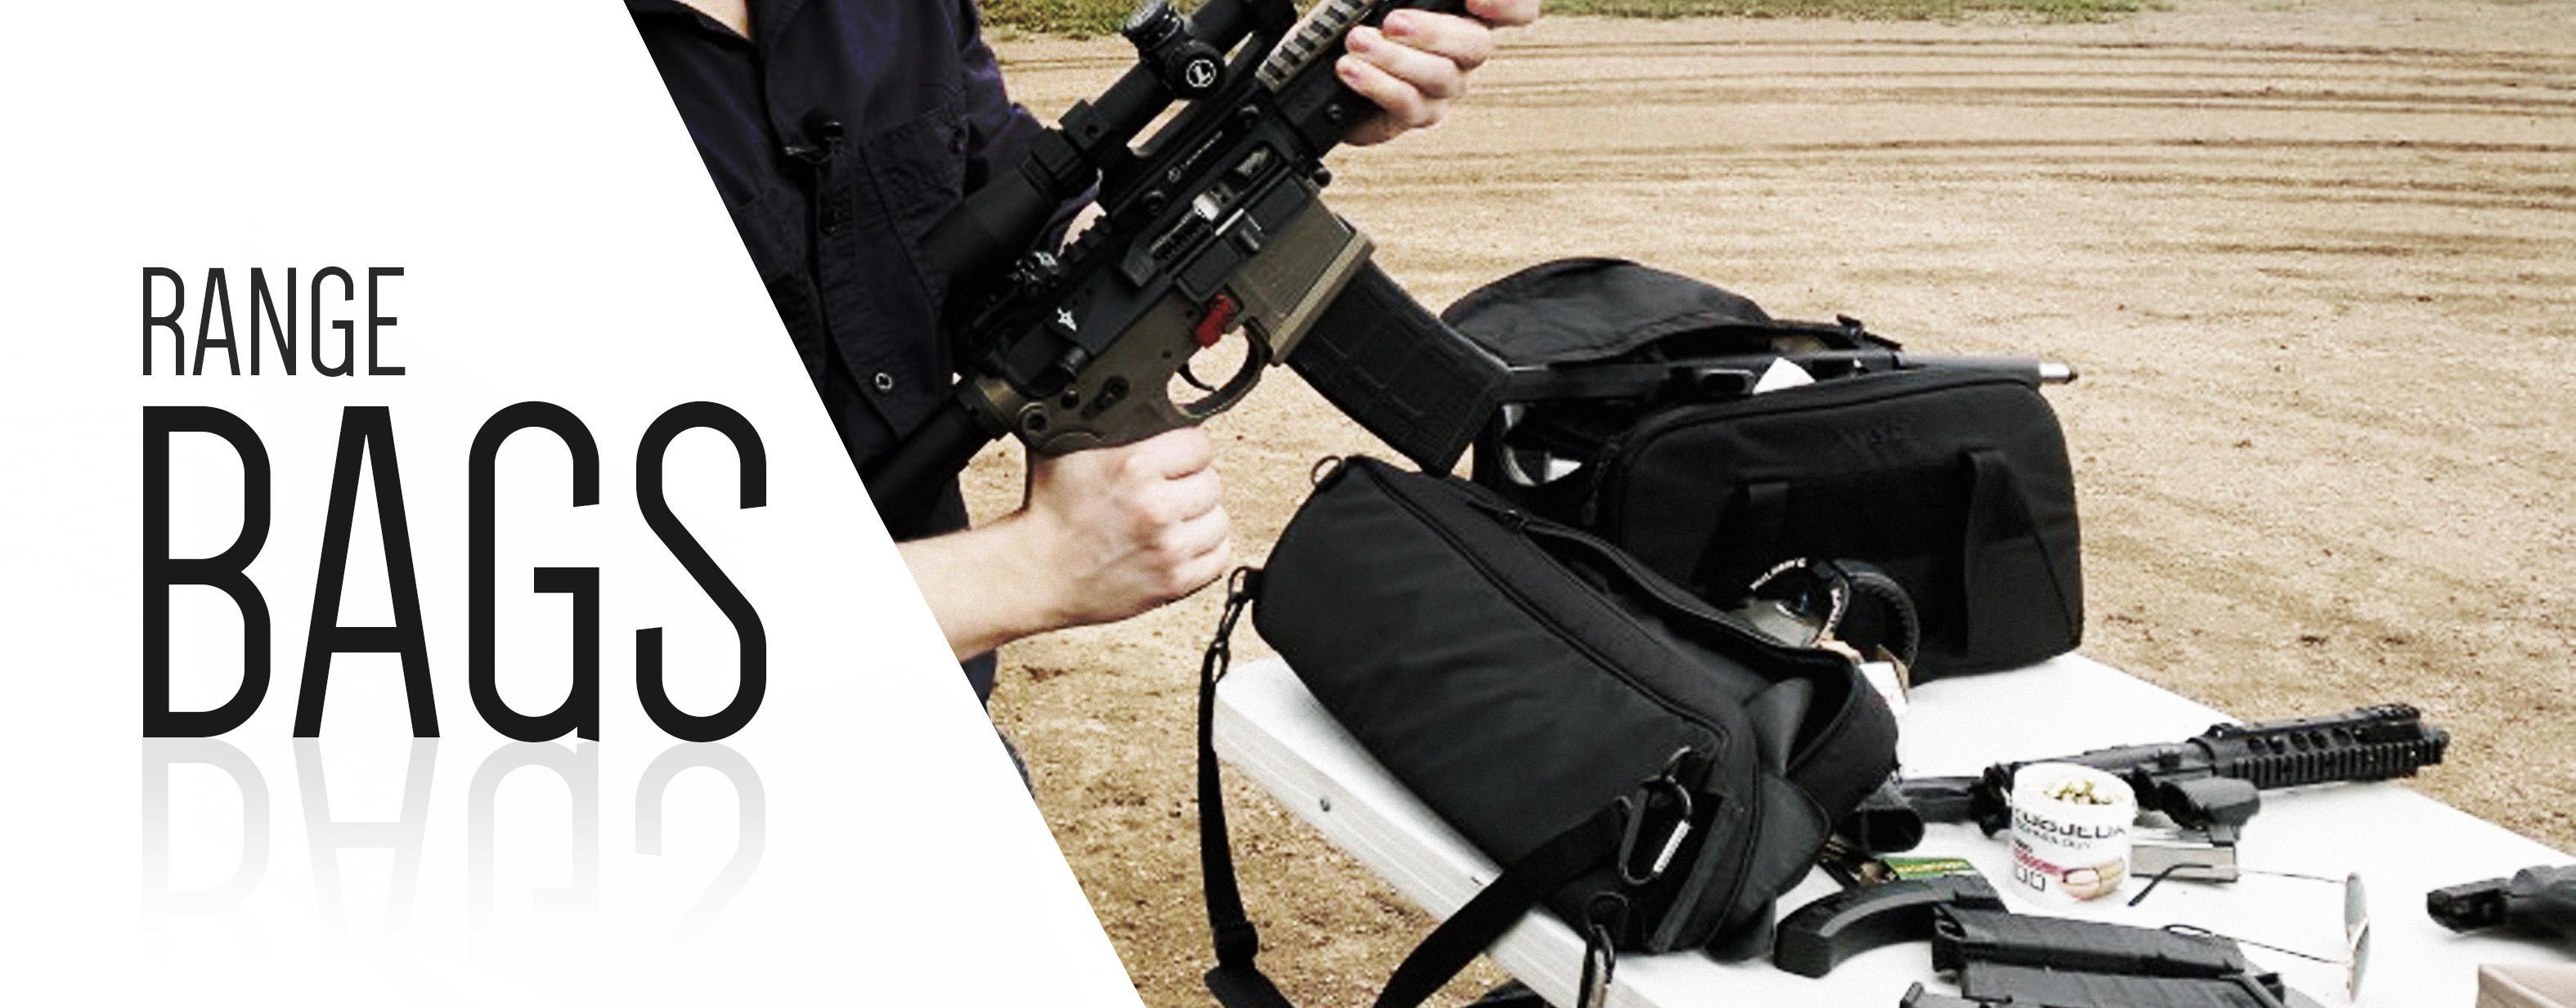 2c9fdb8ef279 Bags - Range Bags - Tactical Asia - Philippines